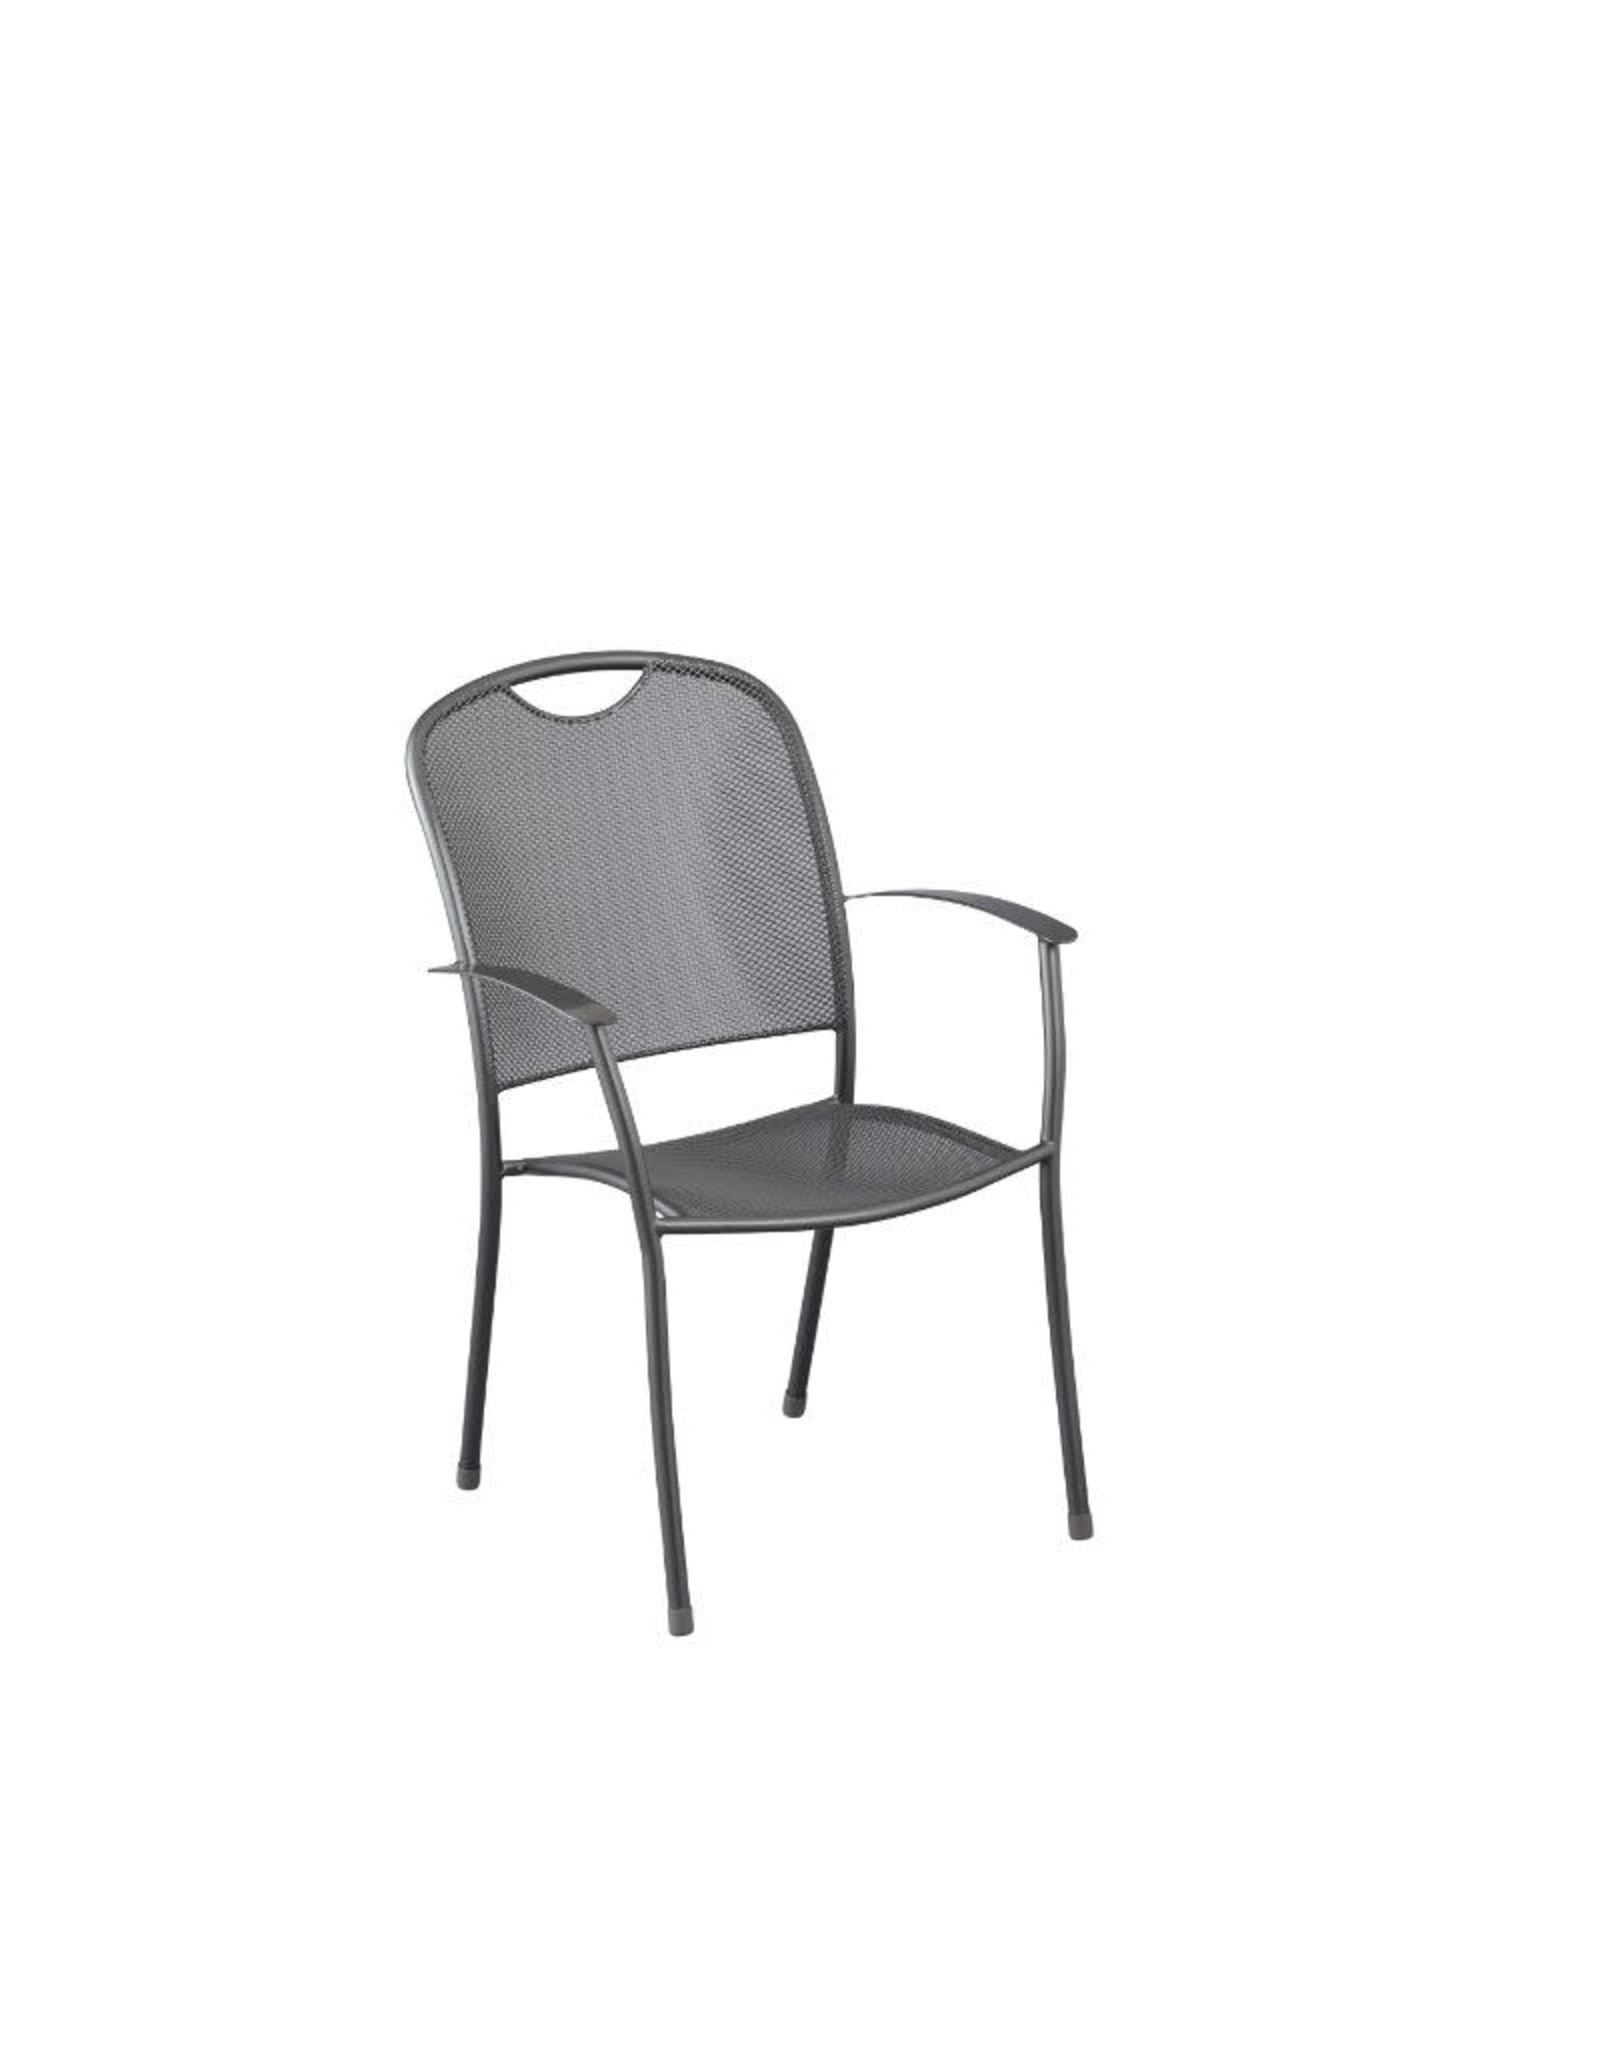 Engarden Engarden - Kettler KOS stapelfauteuil strekmetaal